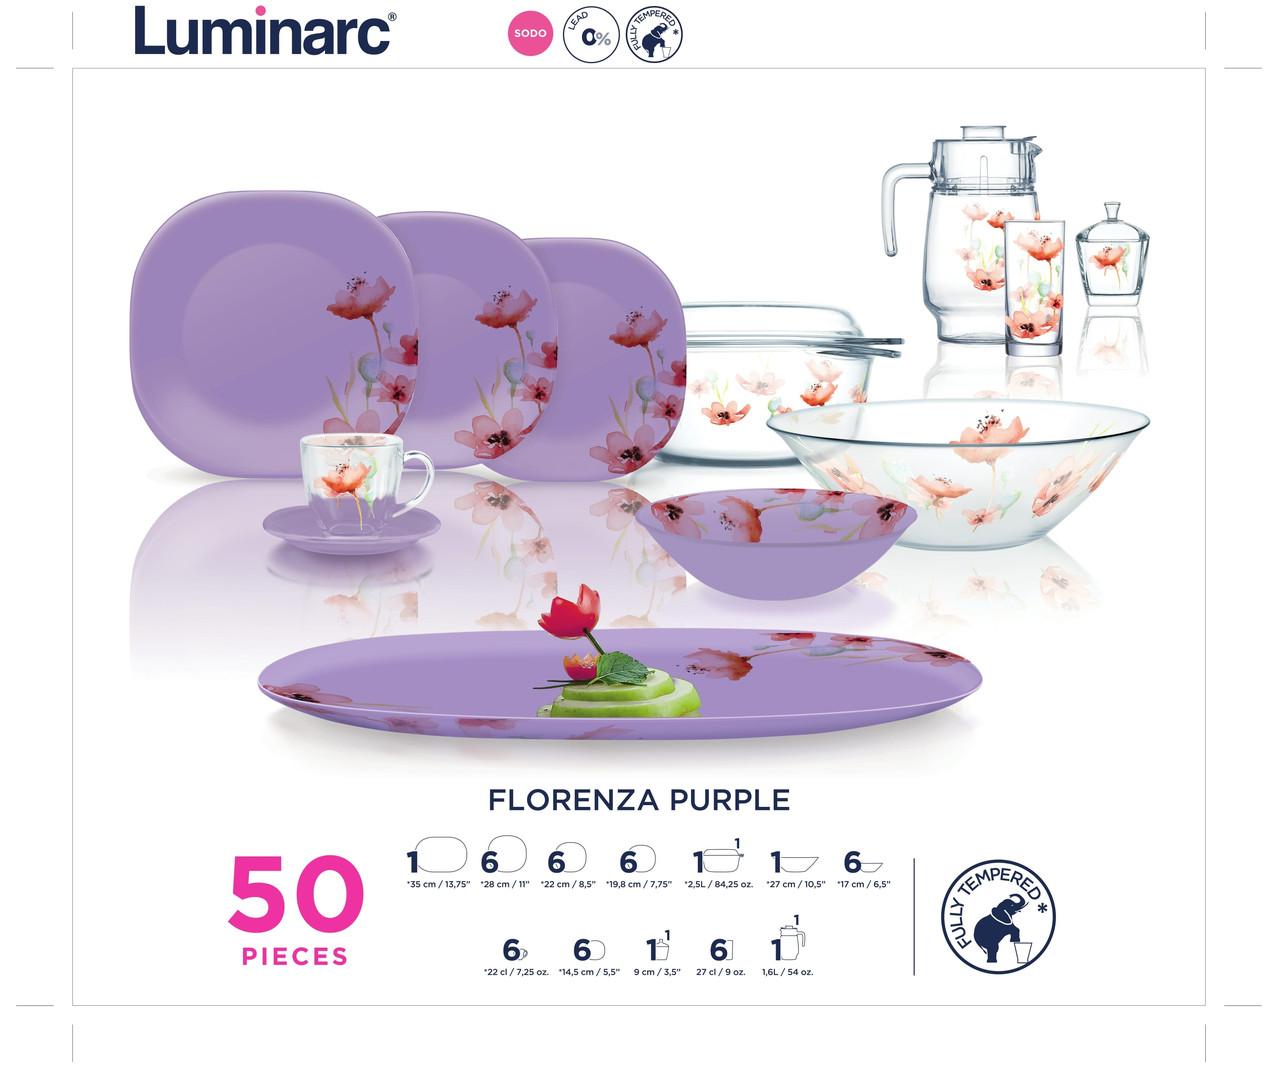 Столовый сервиз Luminarc FLORENZA PURPLE 50пр. на 6персон